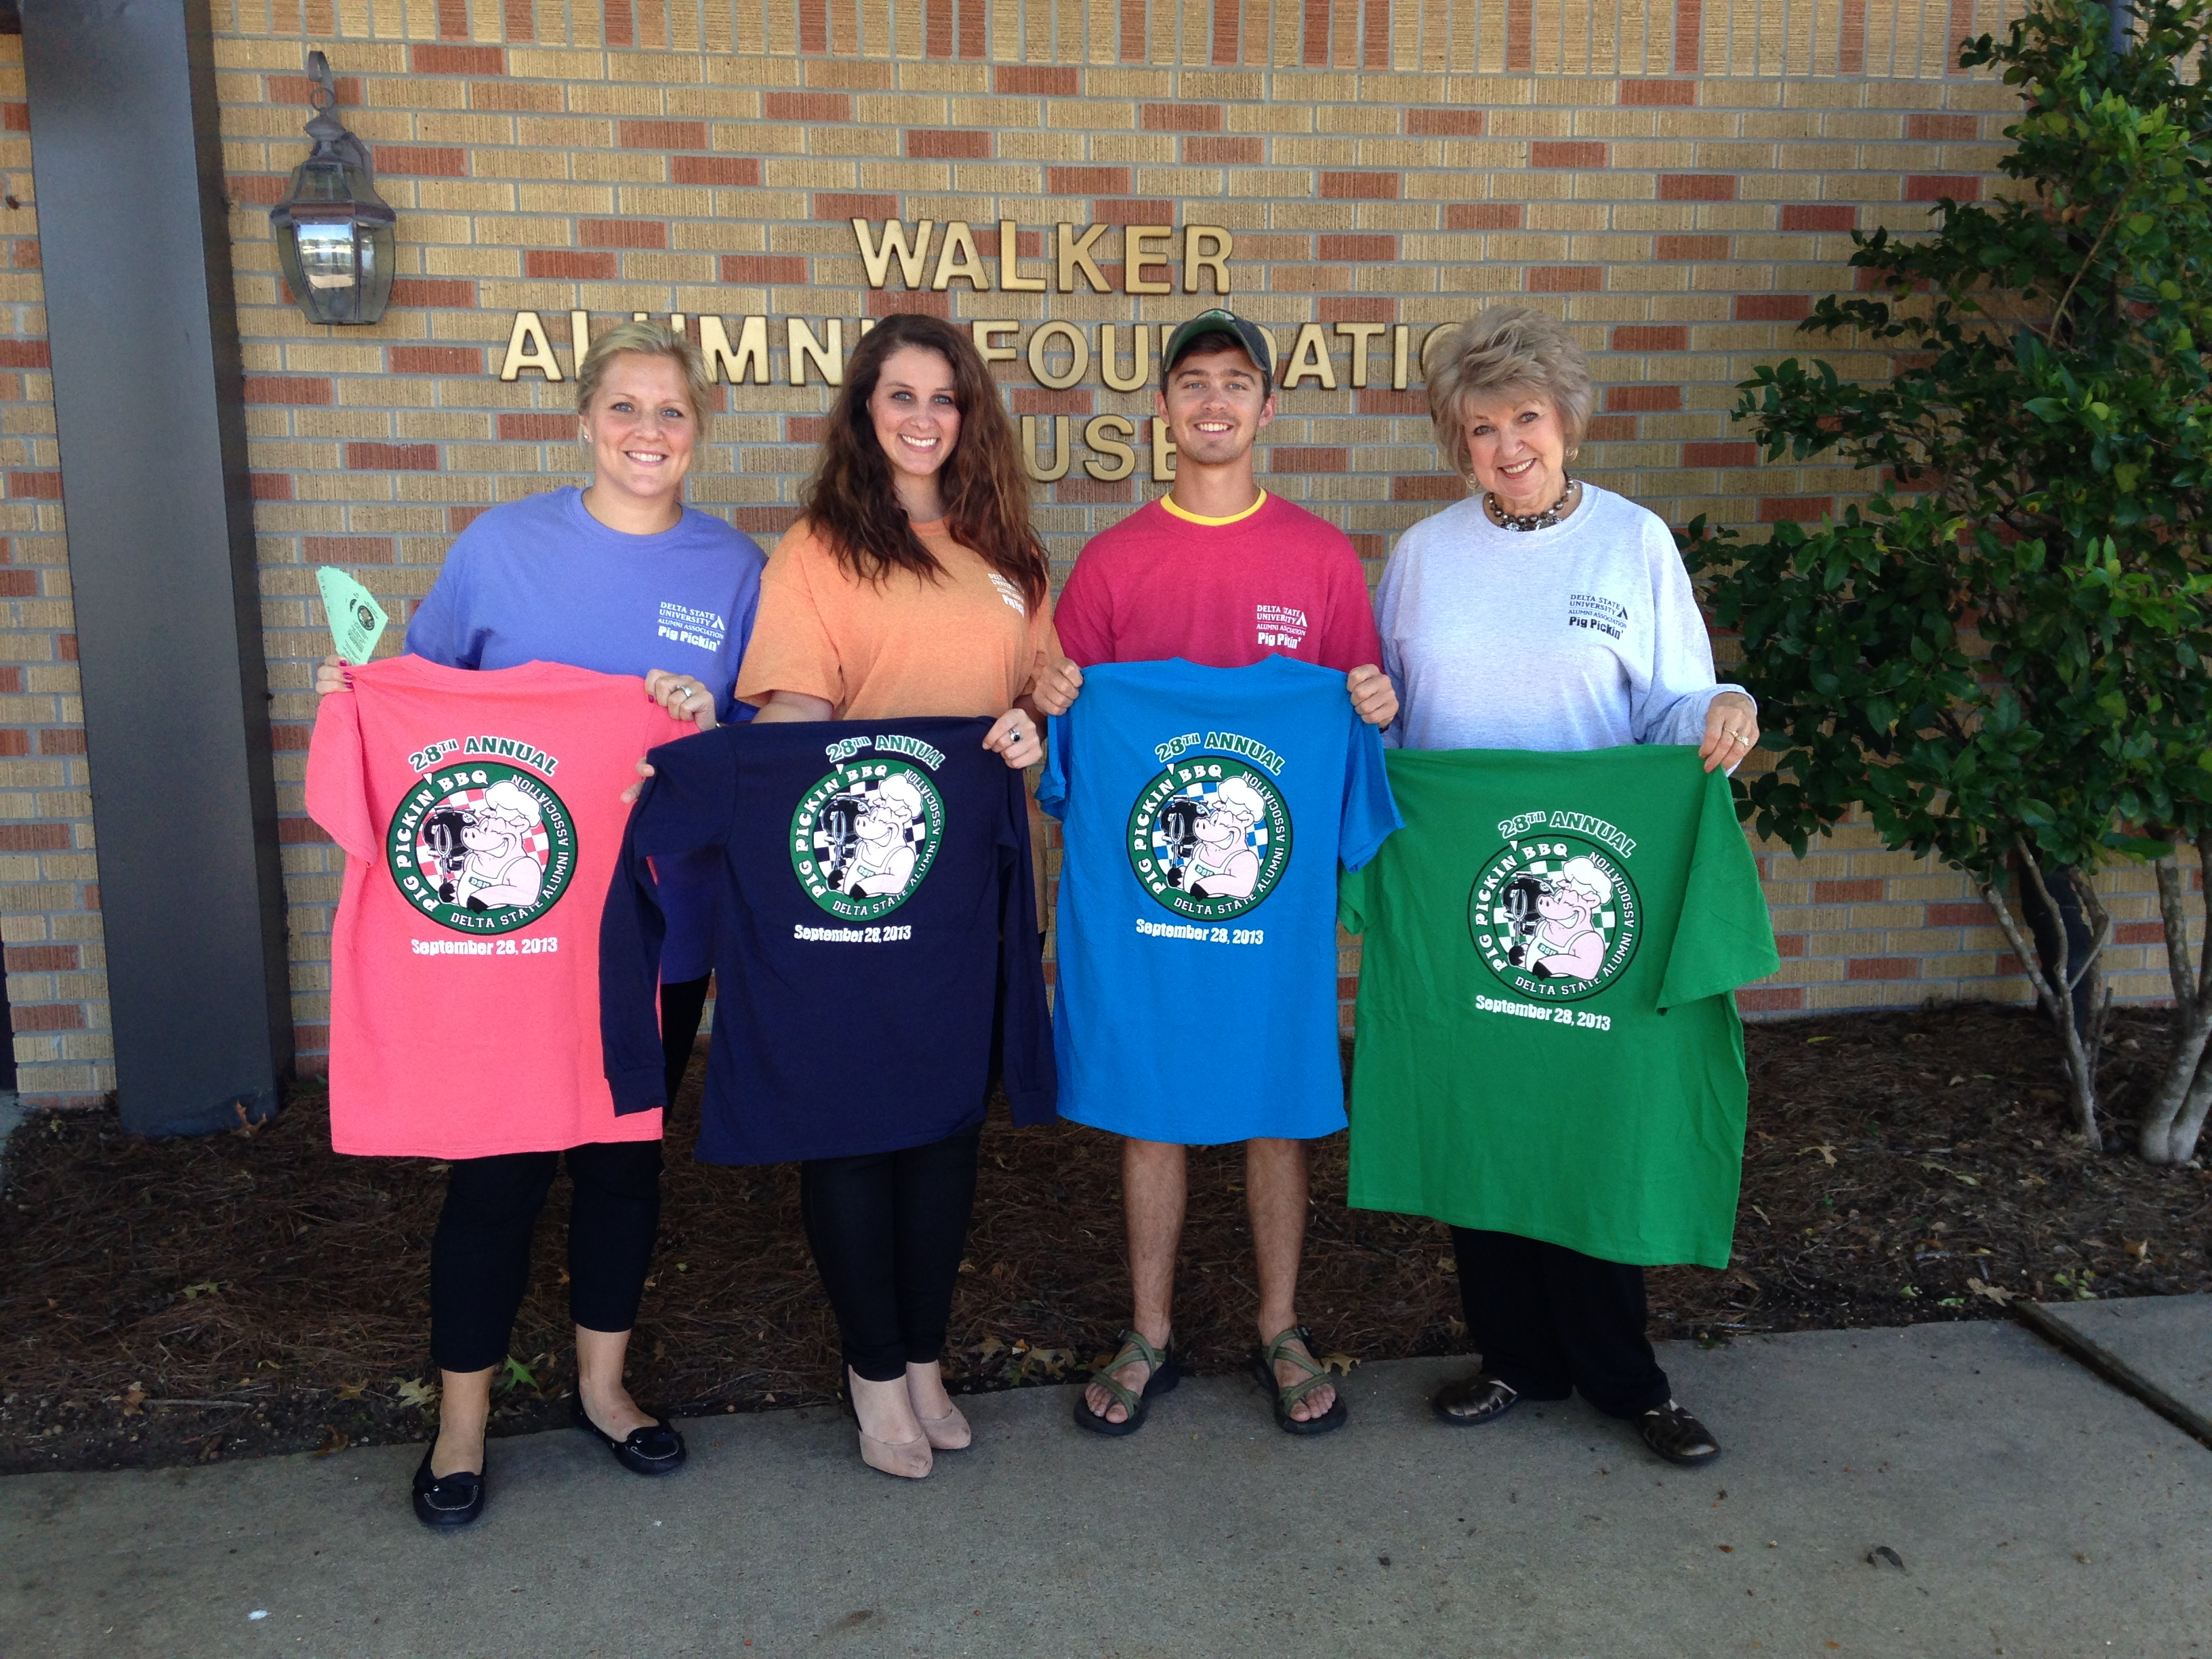 Models holding pig pickin t-shirts